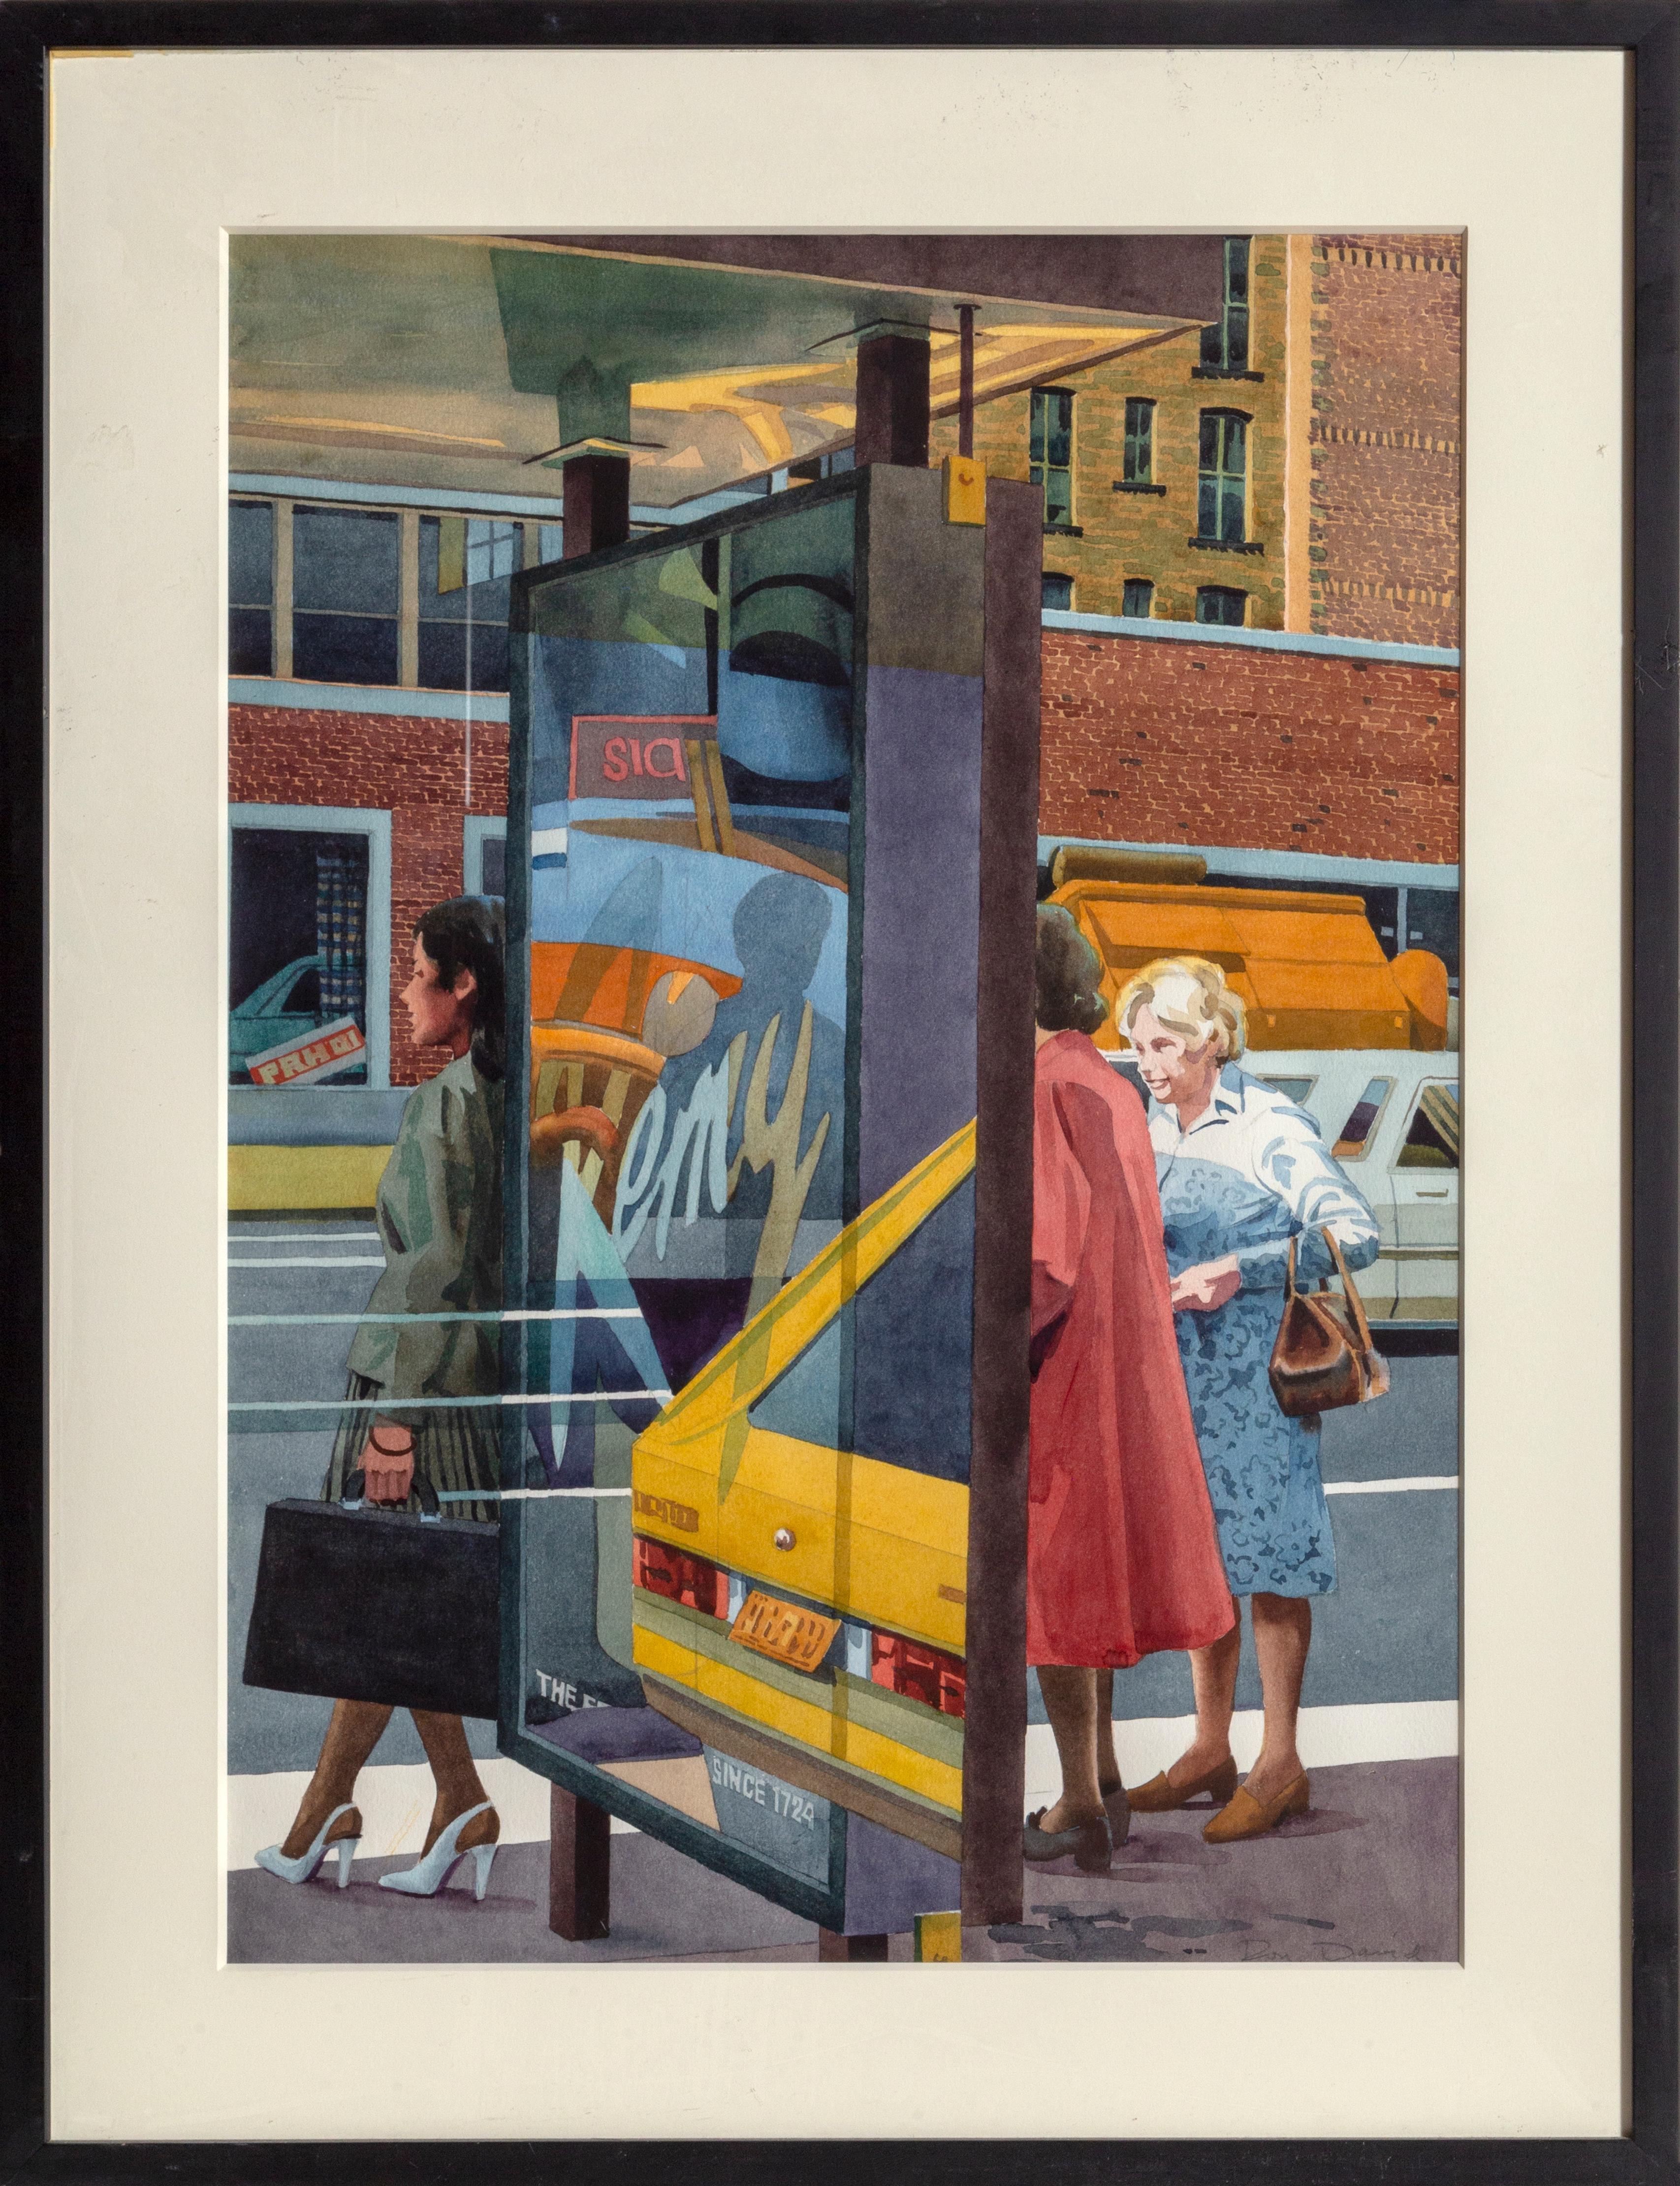 Bus Stop, New York City